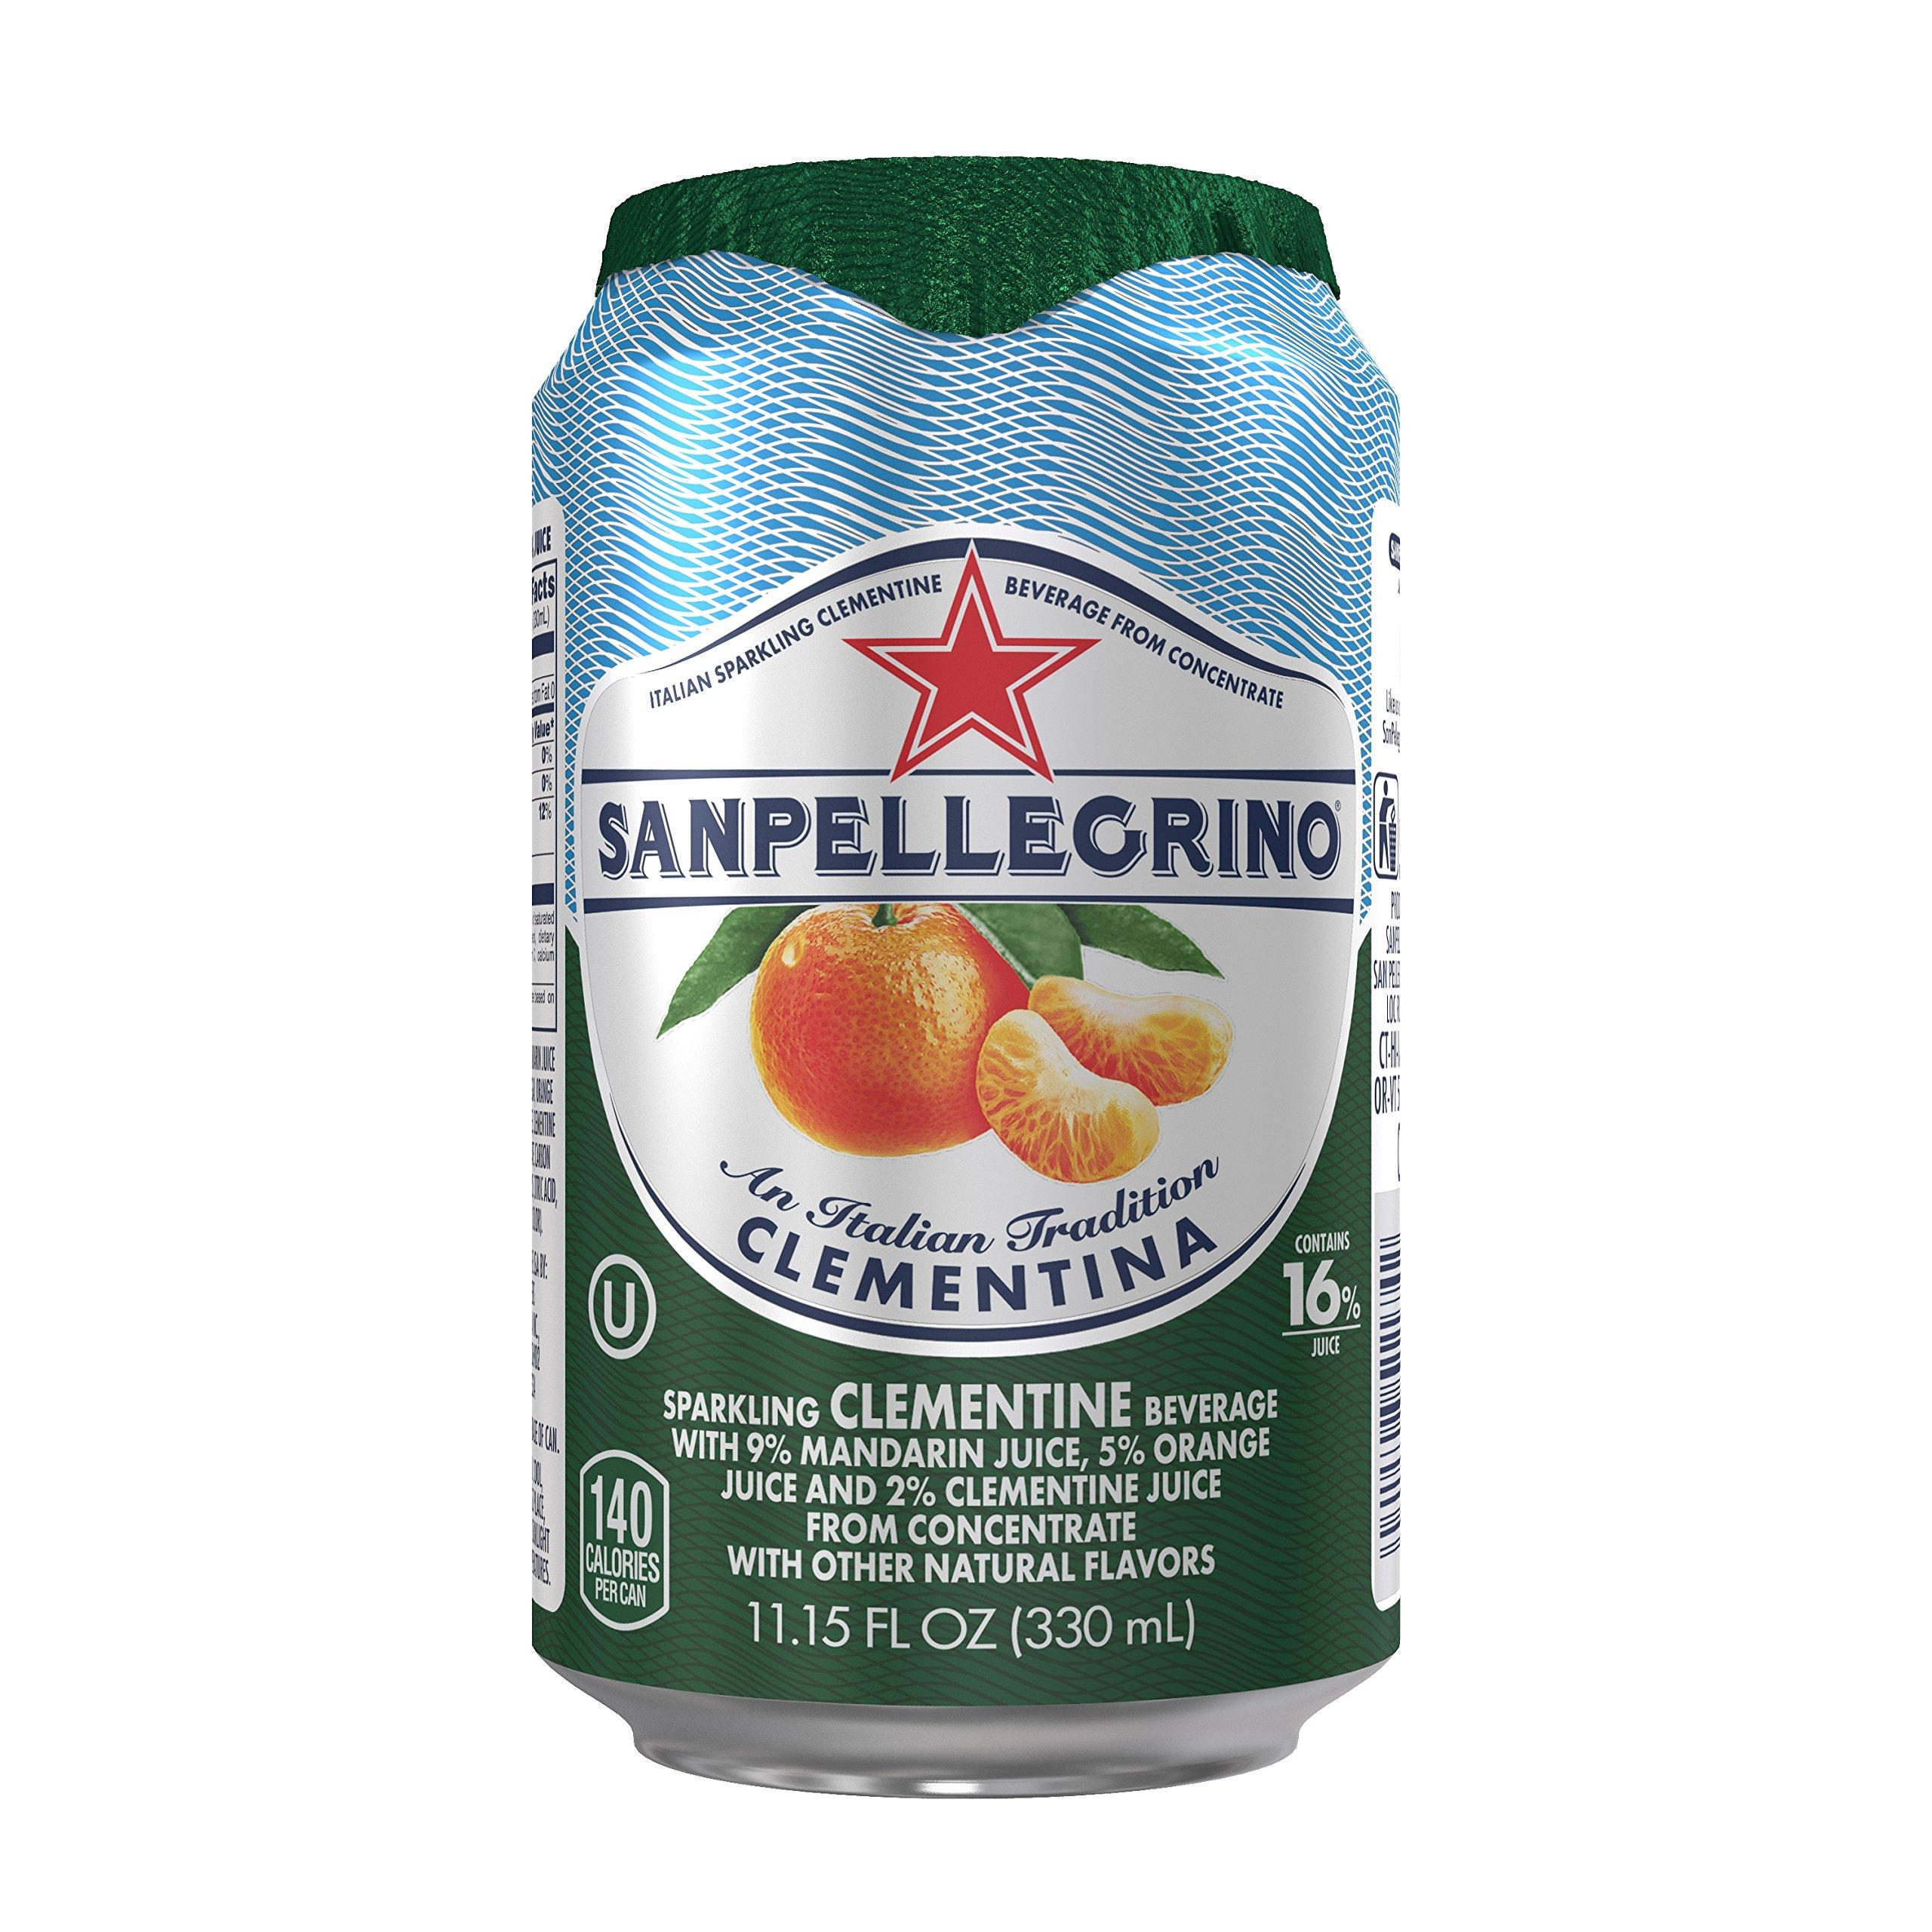 Sanpellegrino Clementine Sparkling Fruit Beverage, 11.15 fl oz. Cans (24 Count)